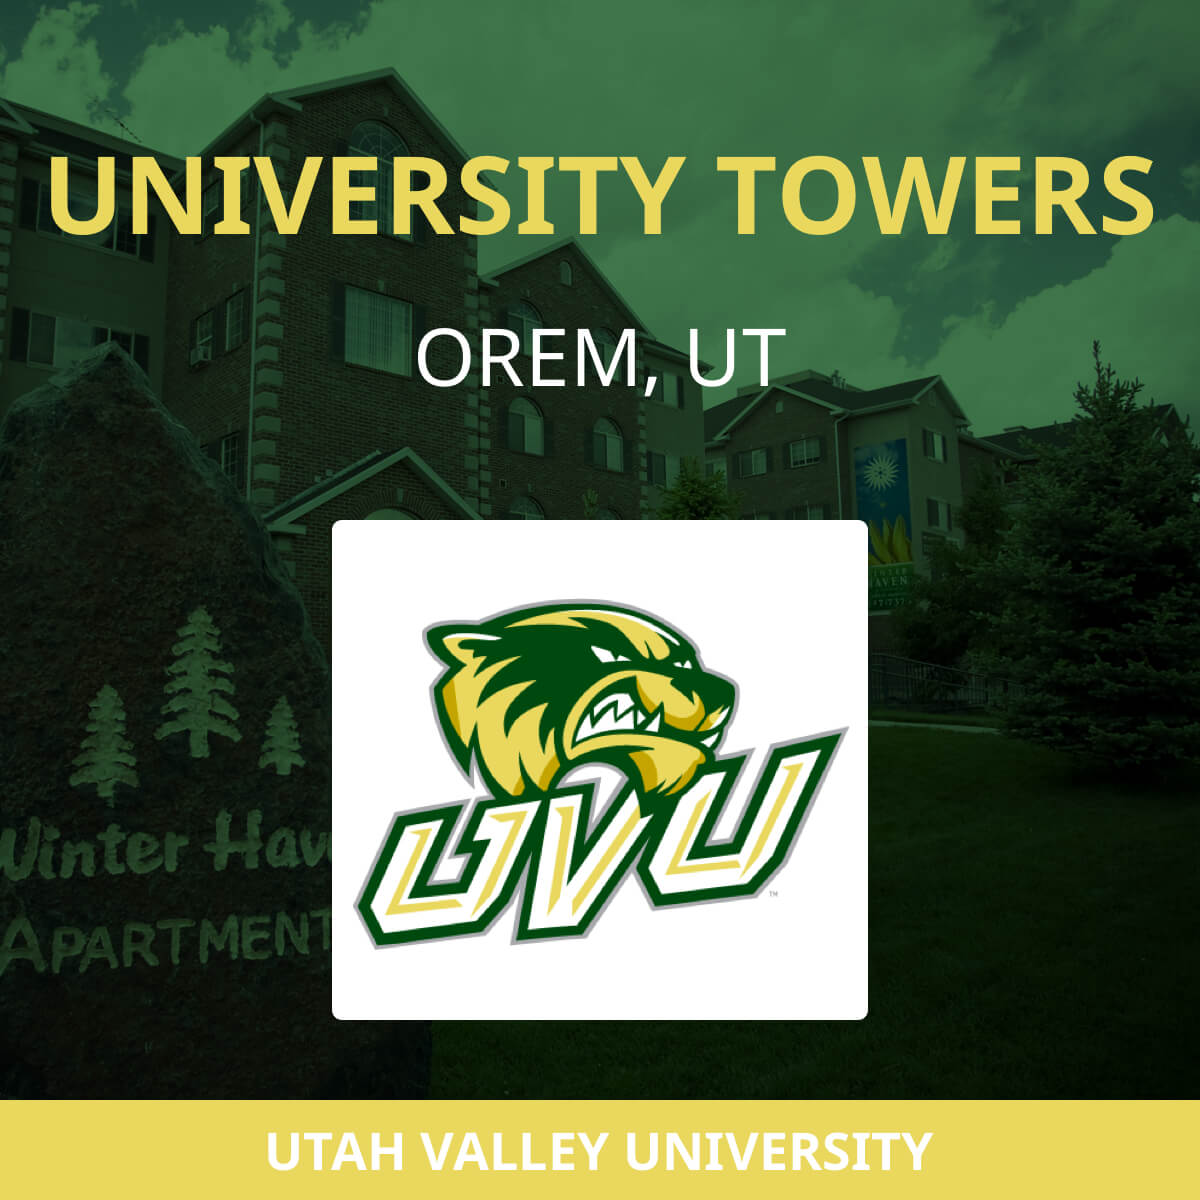 Uvu Off Campus Apartments Orem Ut 84058 University Towers Student Housing